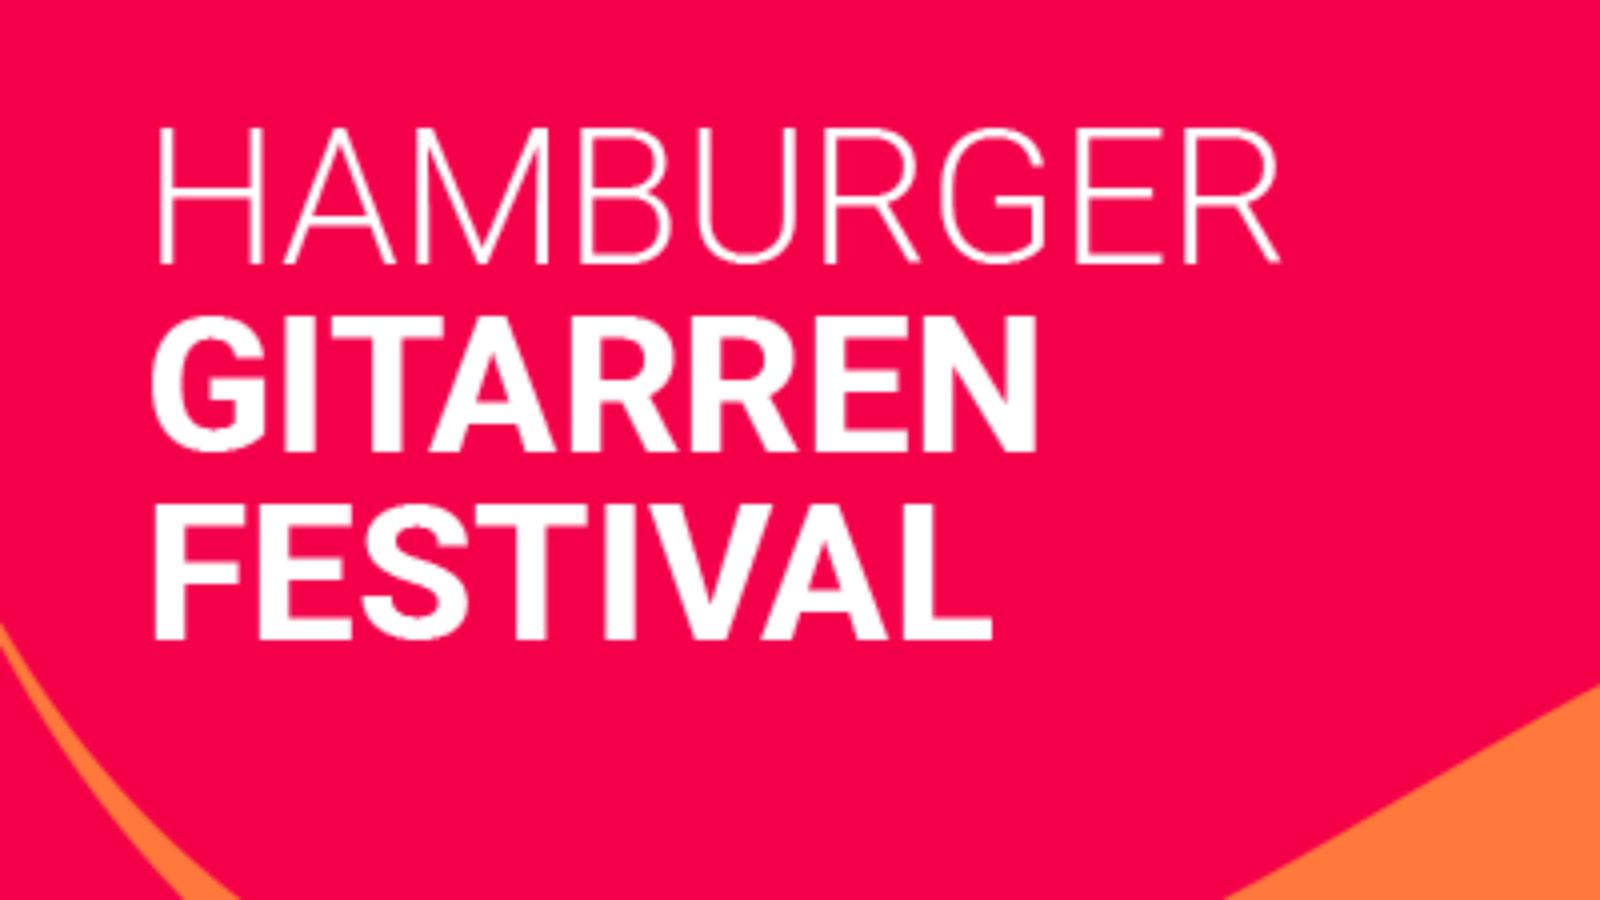 9. Hamburger Gitarrenfestival-Infovideo zum Hygienekonzept